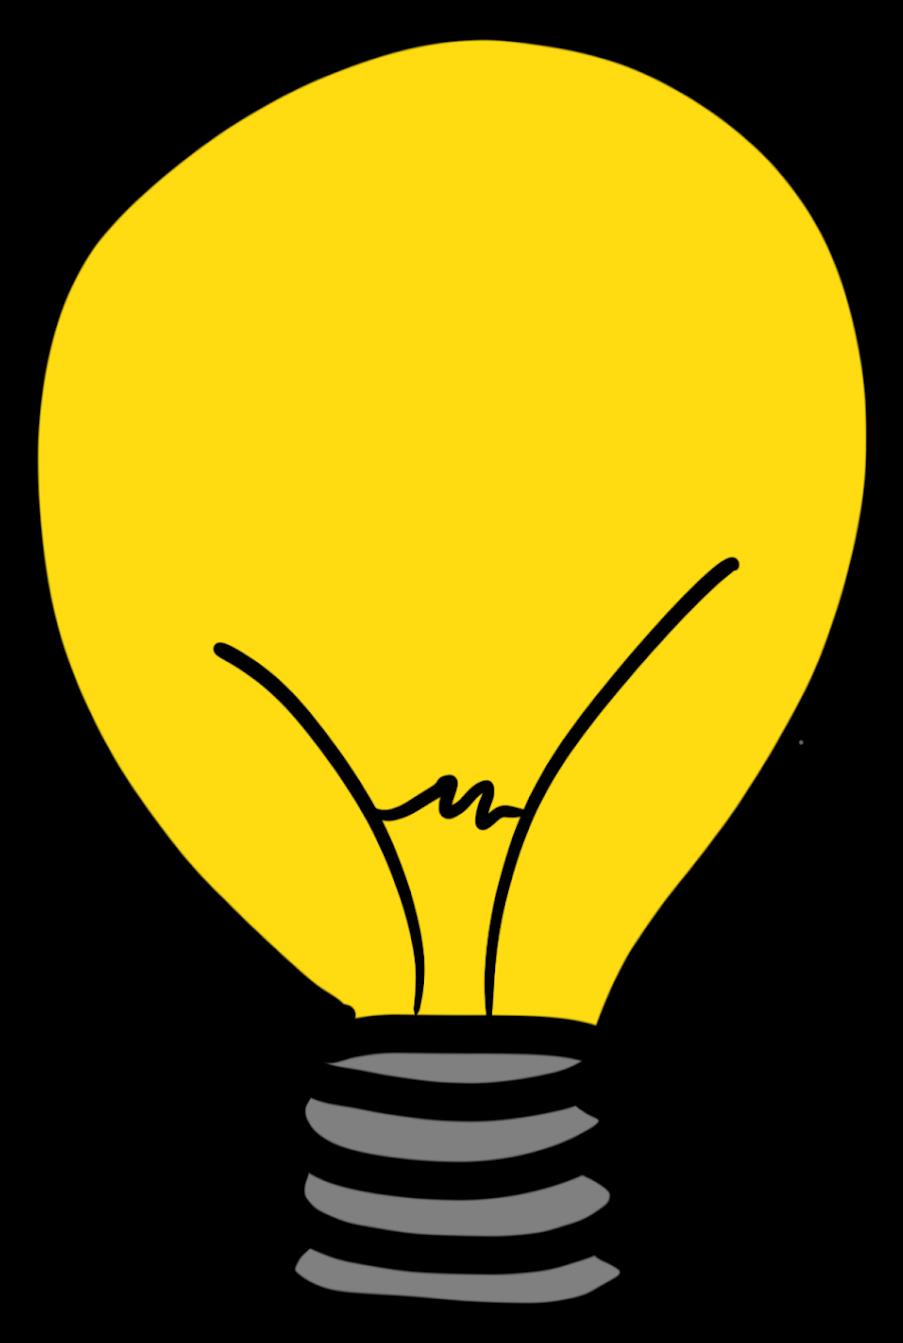 Lightbulb Clipart Reflection - Incandescent Light Bulb ...